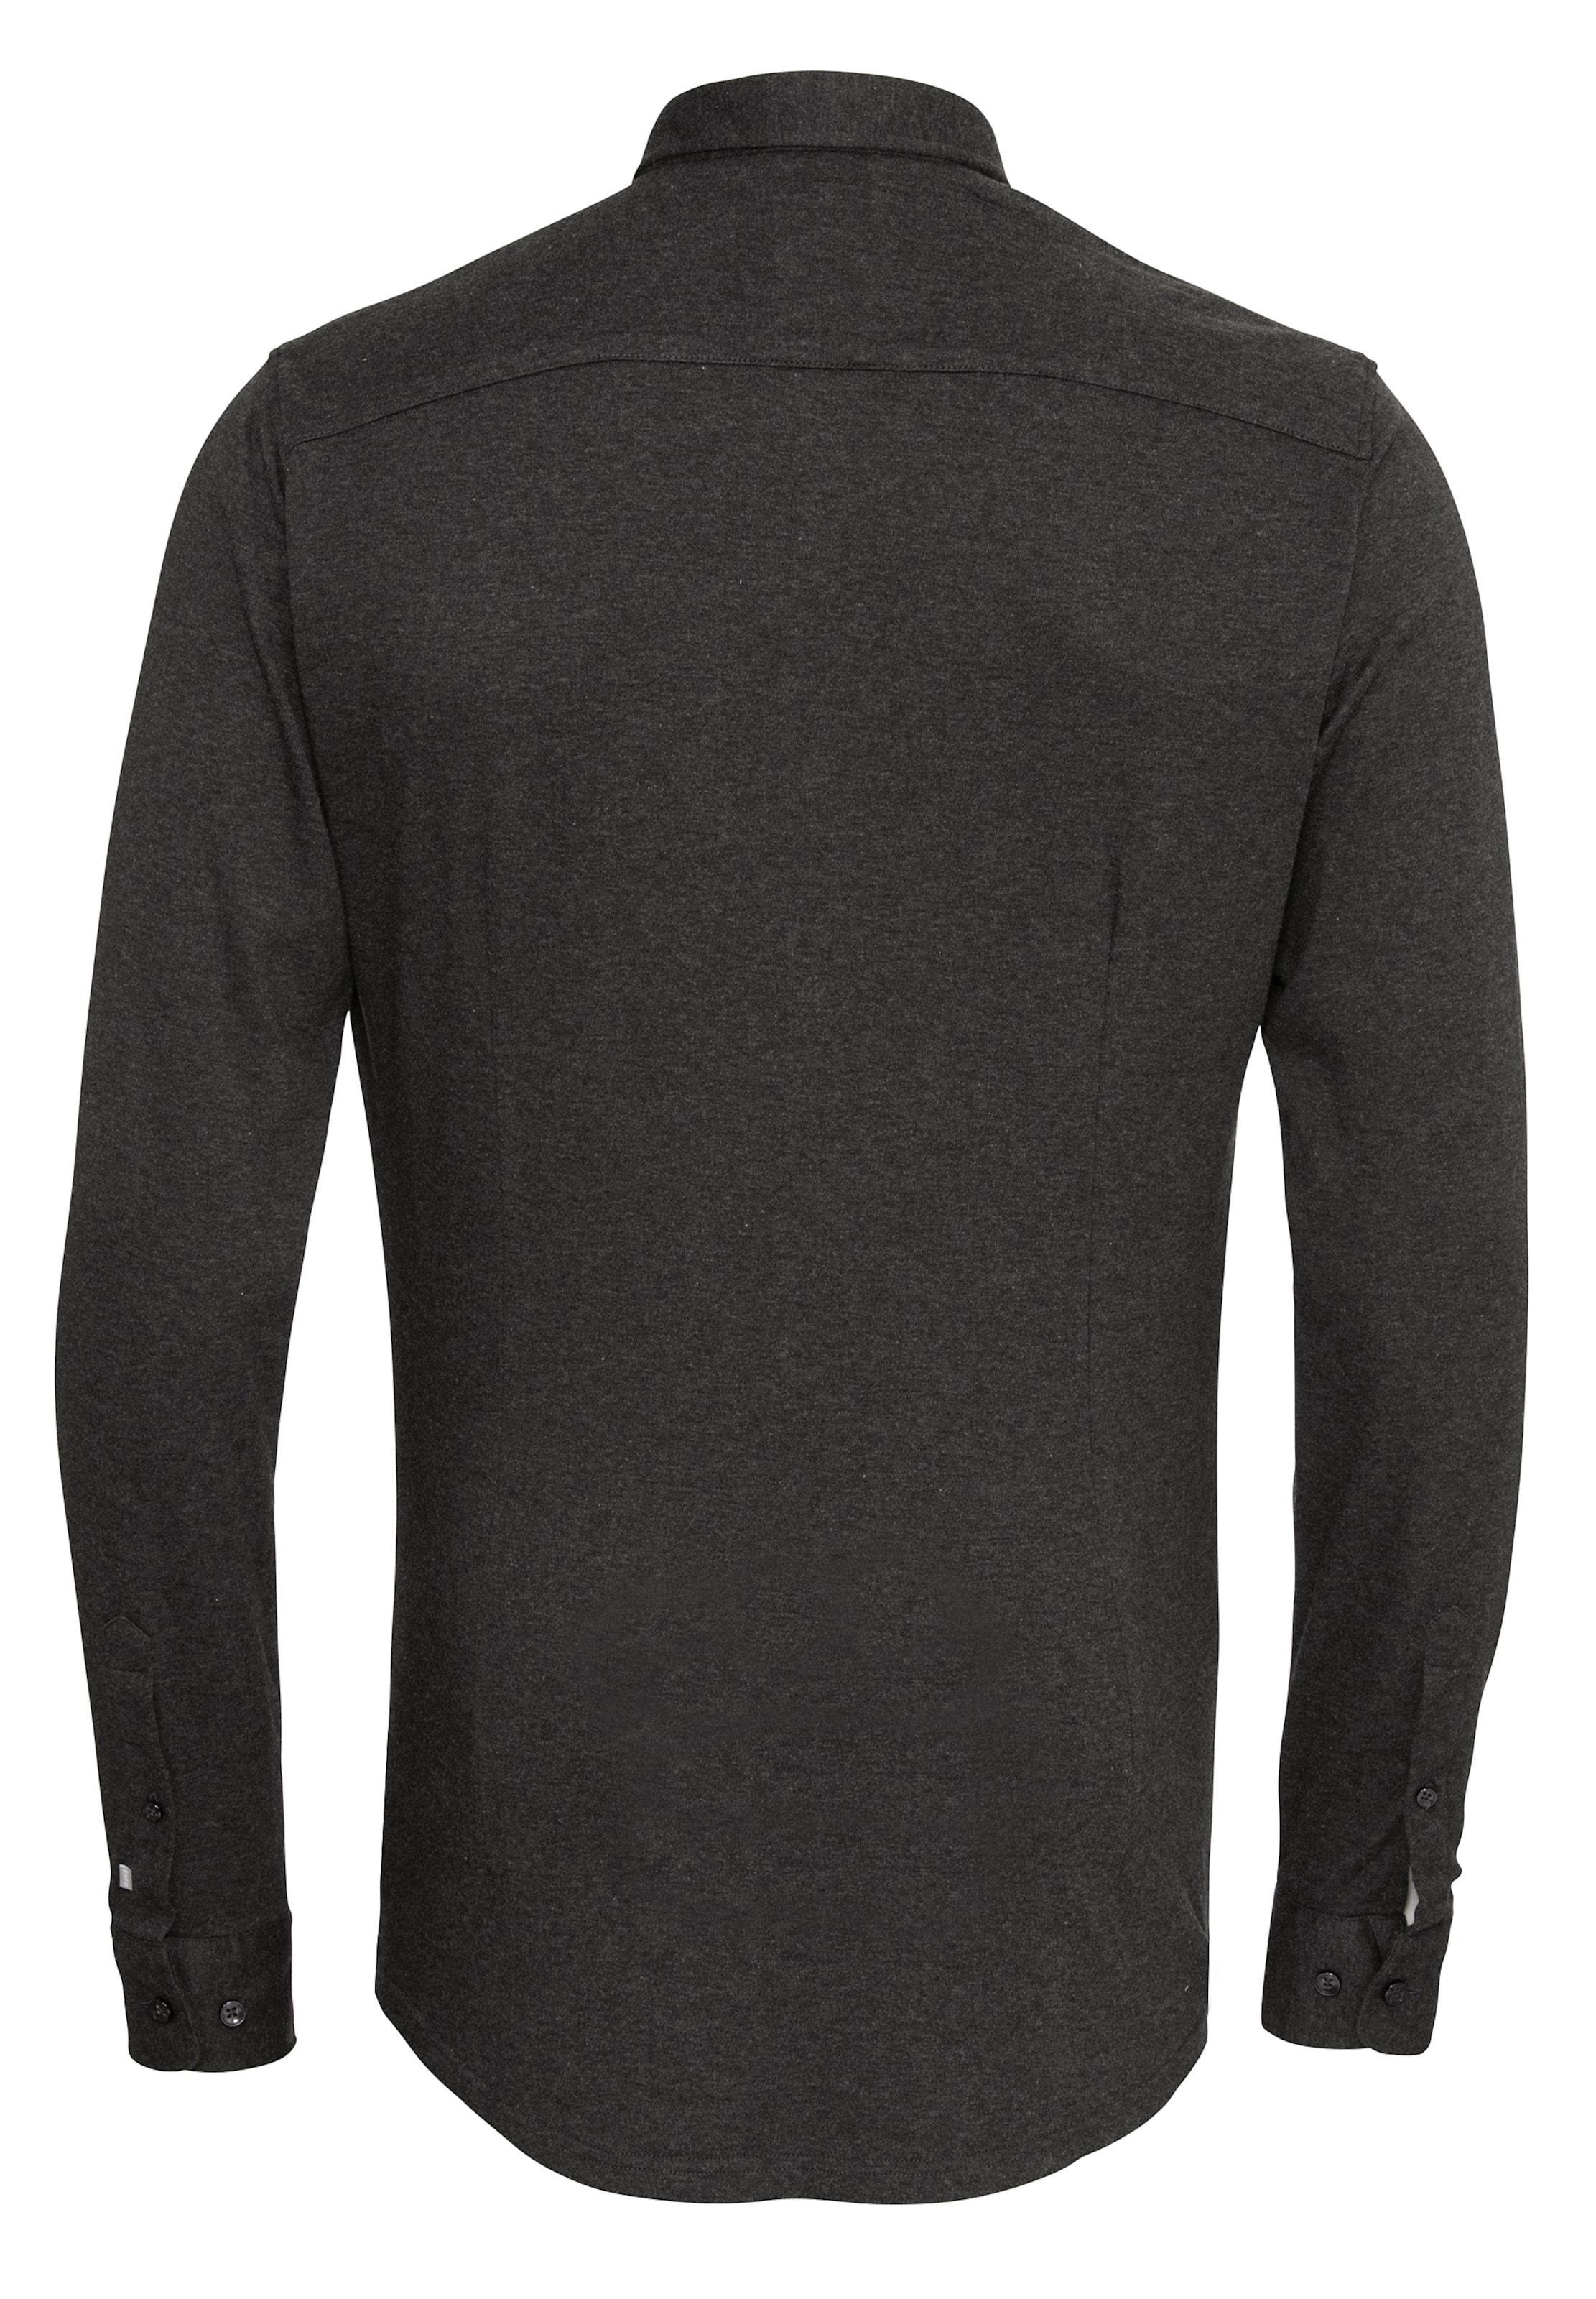 PURE Langarm-Hemd City Silver Extra Slim Freies Verschiffen Bester Verkauf Rabatt-Spielraum Auslass Echt Limit Rabatt Große Diskont Günstig Online iQC3t